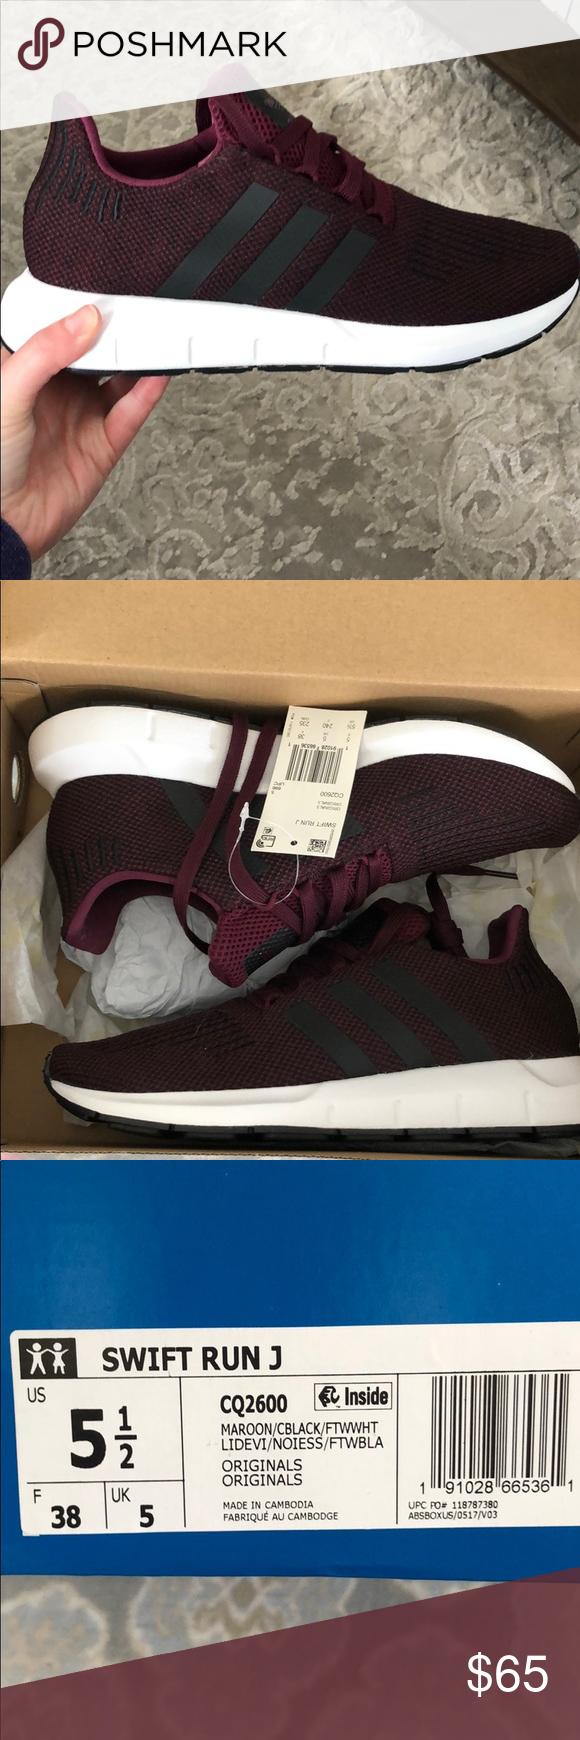 Adidas Swift Run J shoe size 5.5   J